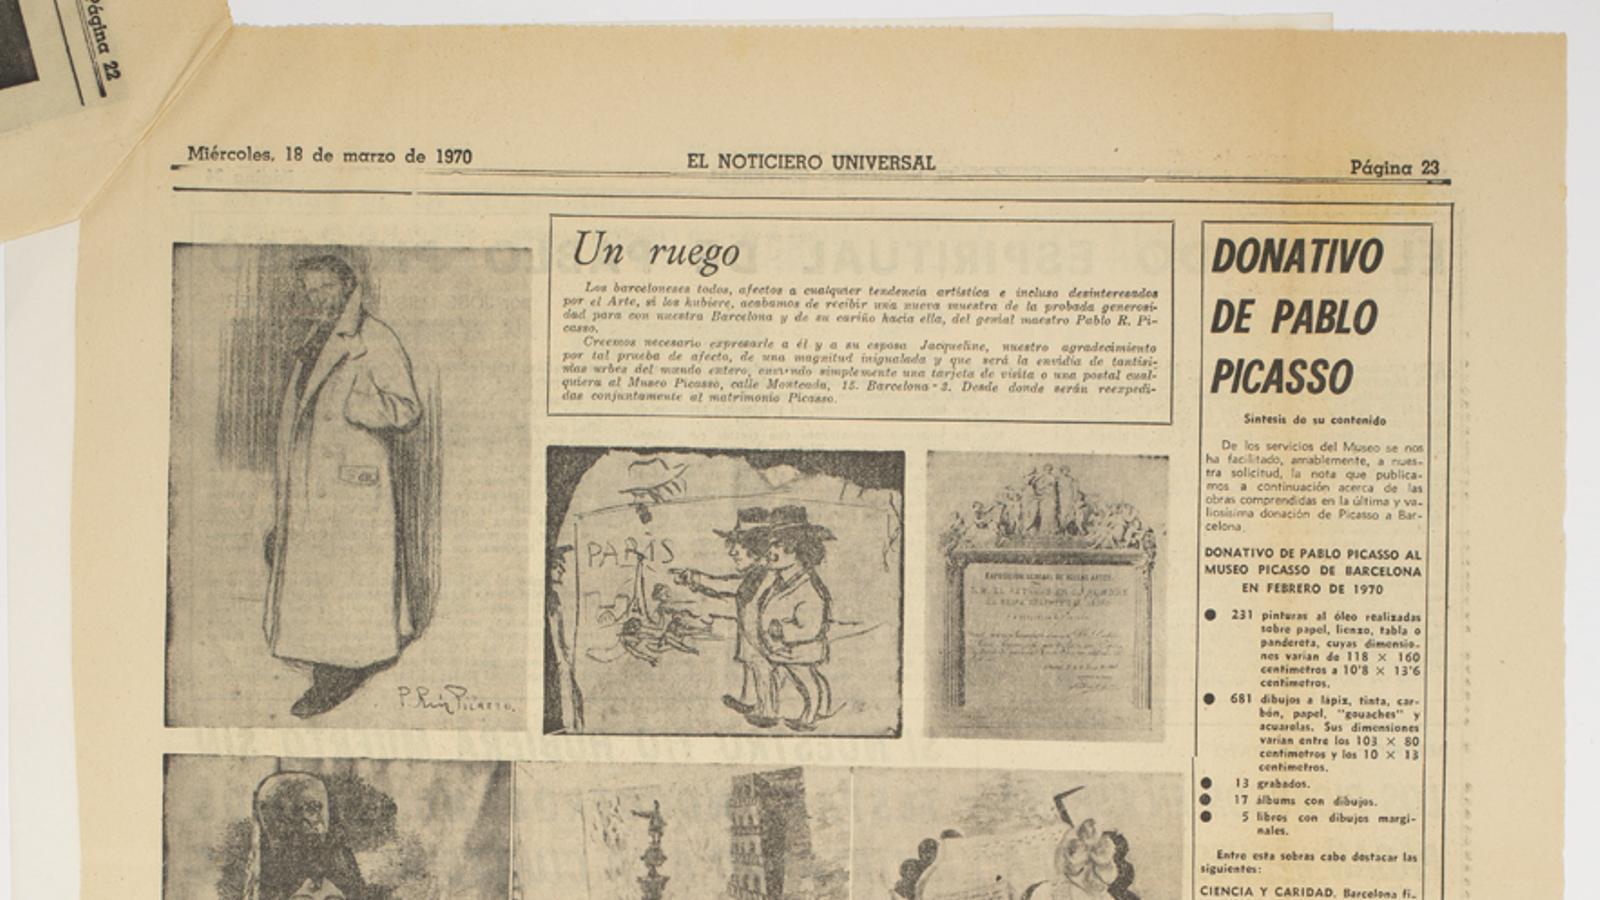 'El Noticiero Universal' va destacar 14 obres de la donació de Picasso de 1970